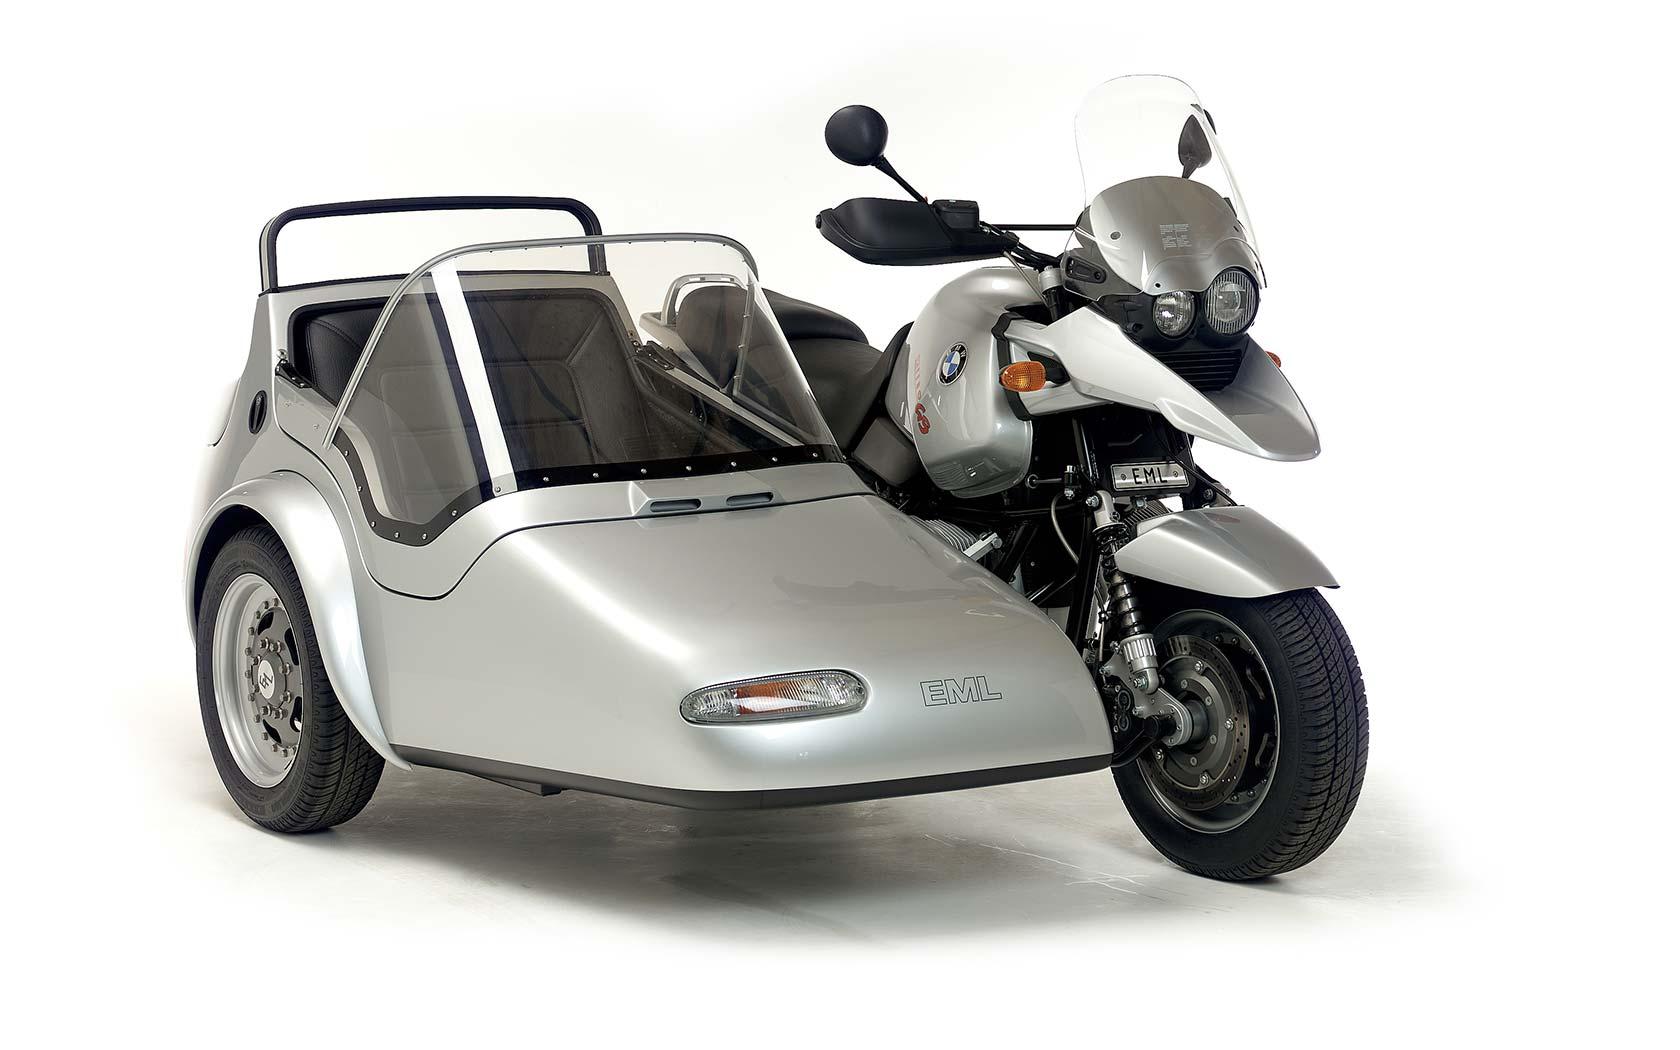 CT 2001 - EML Trikes & Sidecars